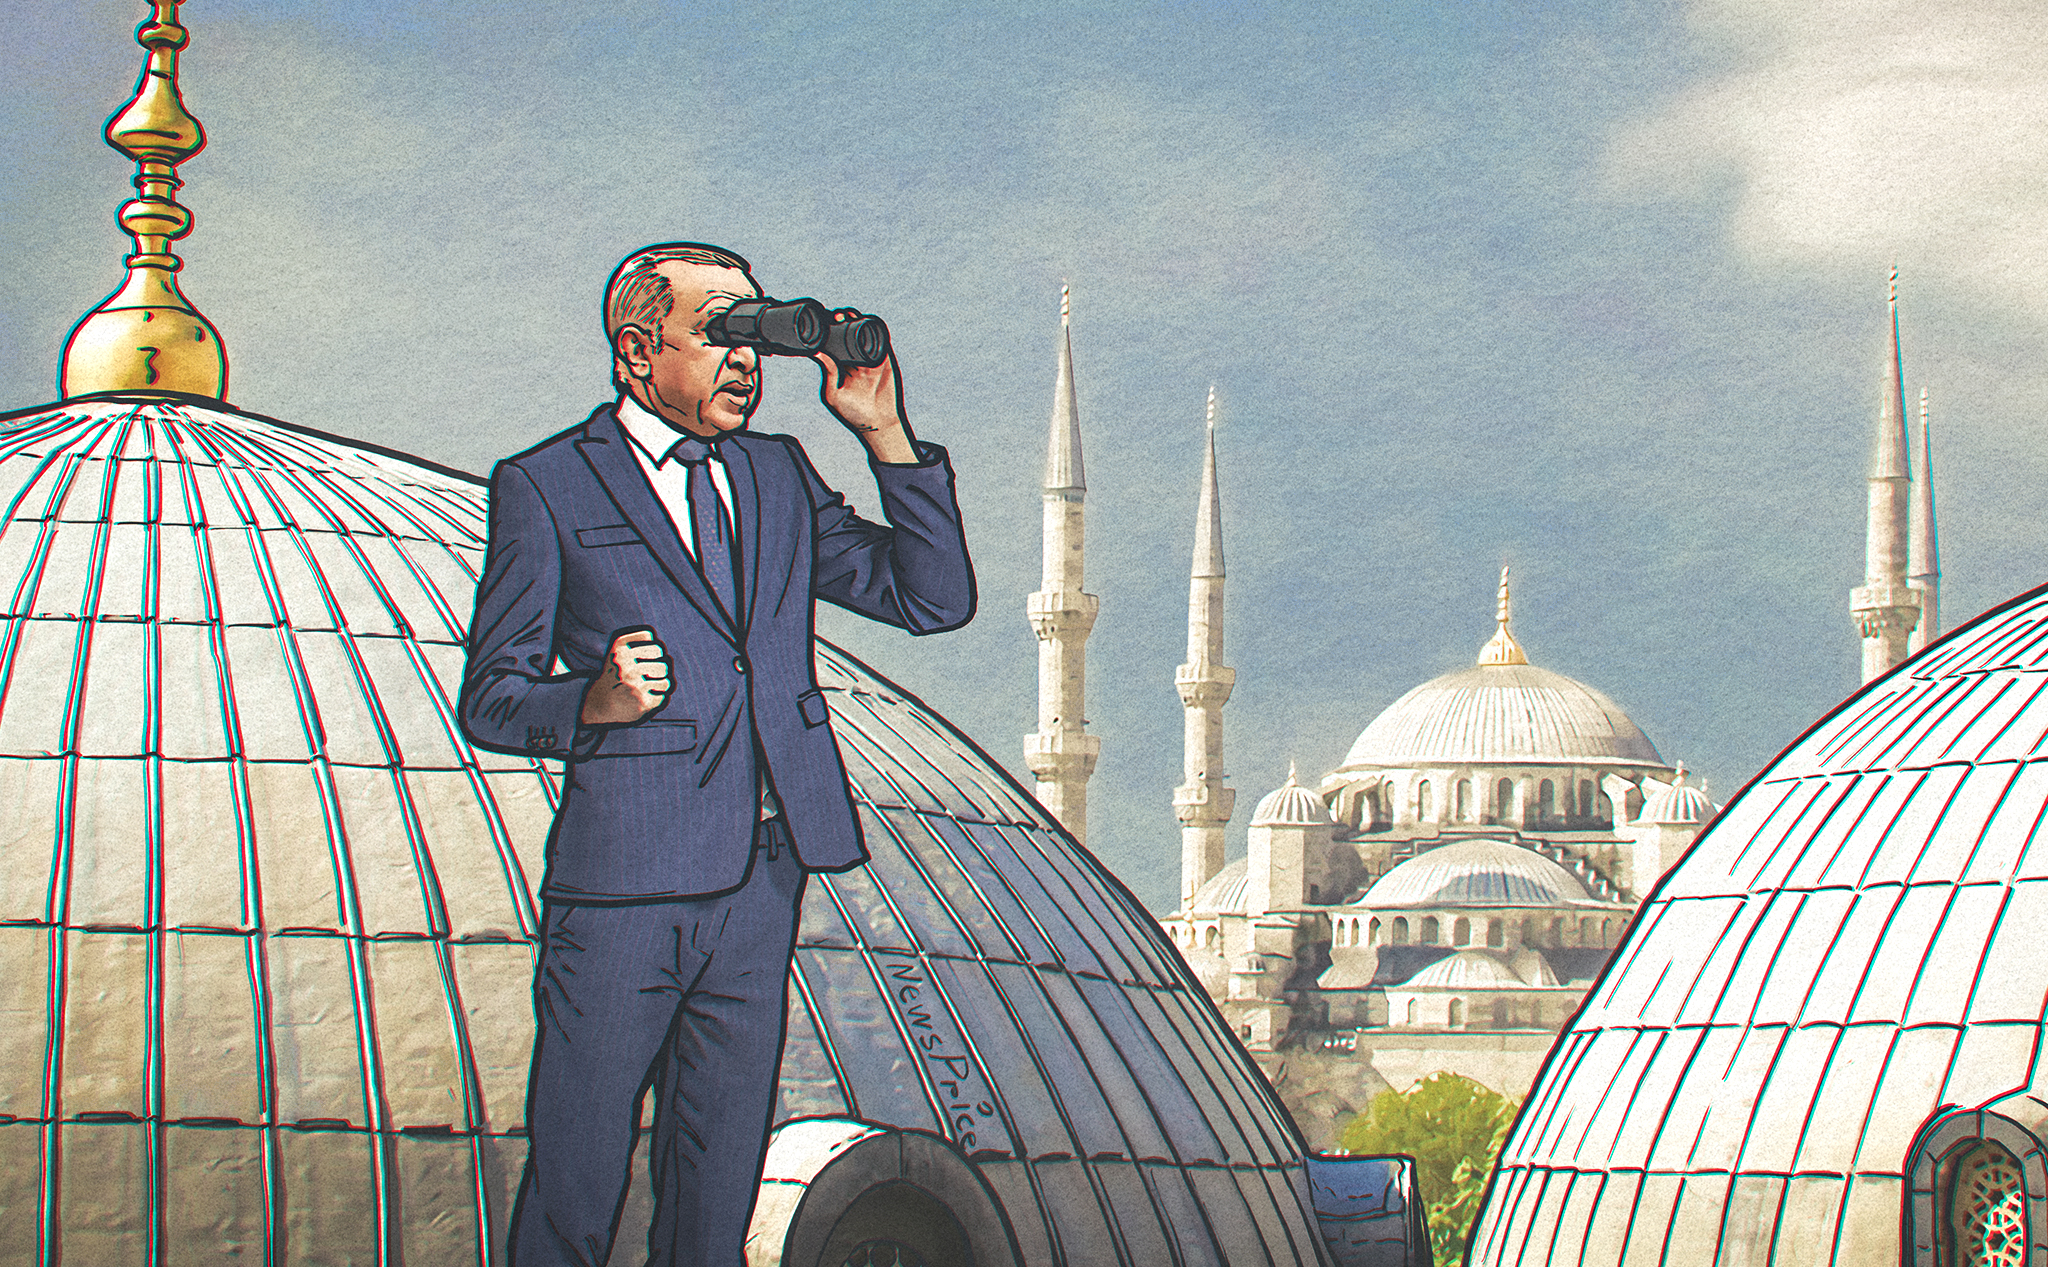 Турецкий взгляд на геополитическую картину мира